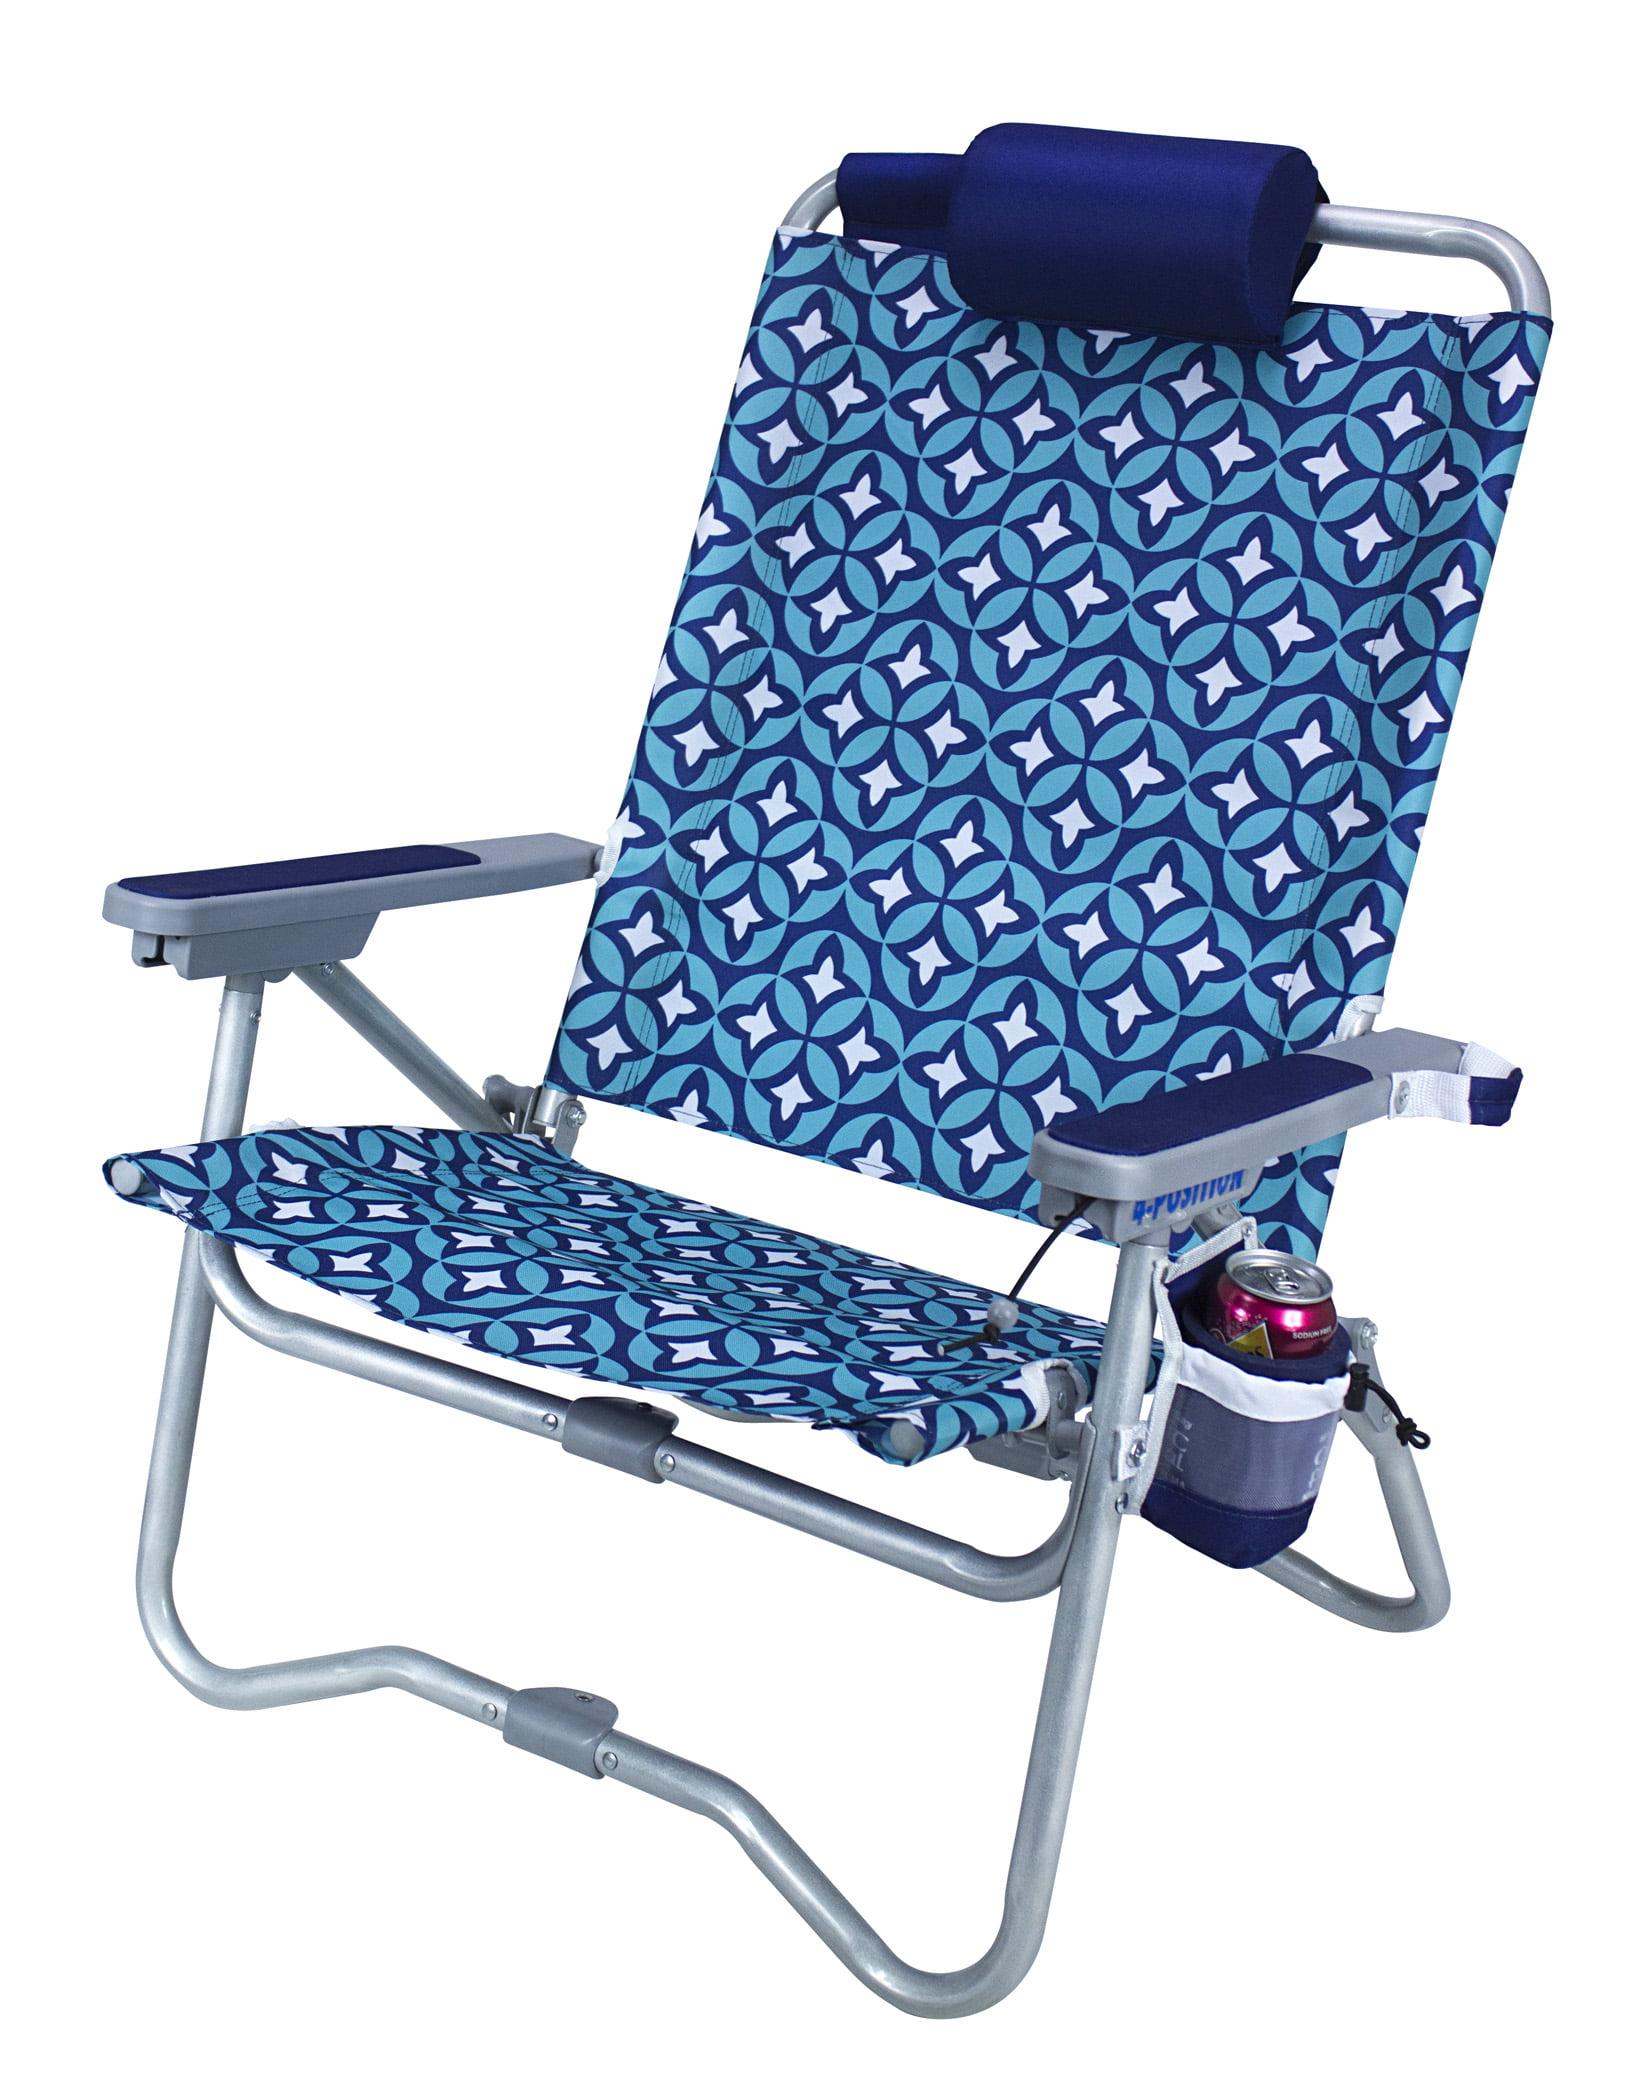 GCI Waterside Bi-Fold Beach Chair, Laguna - Walmart.com